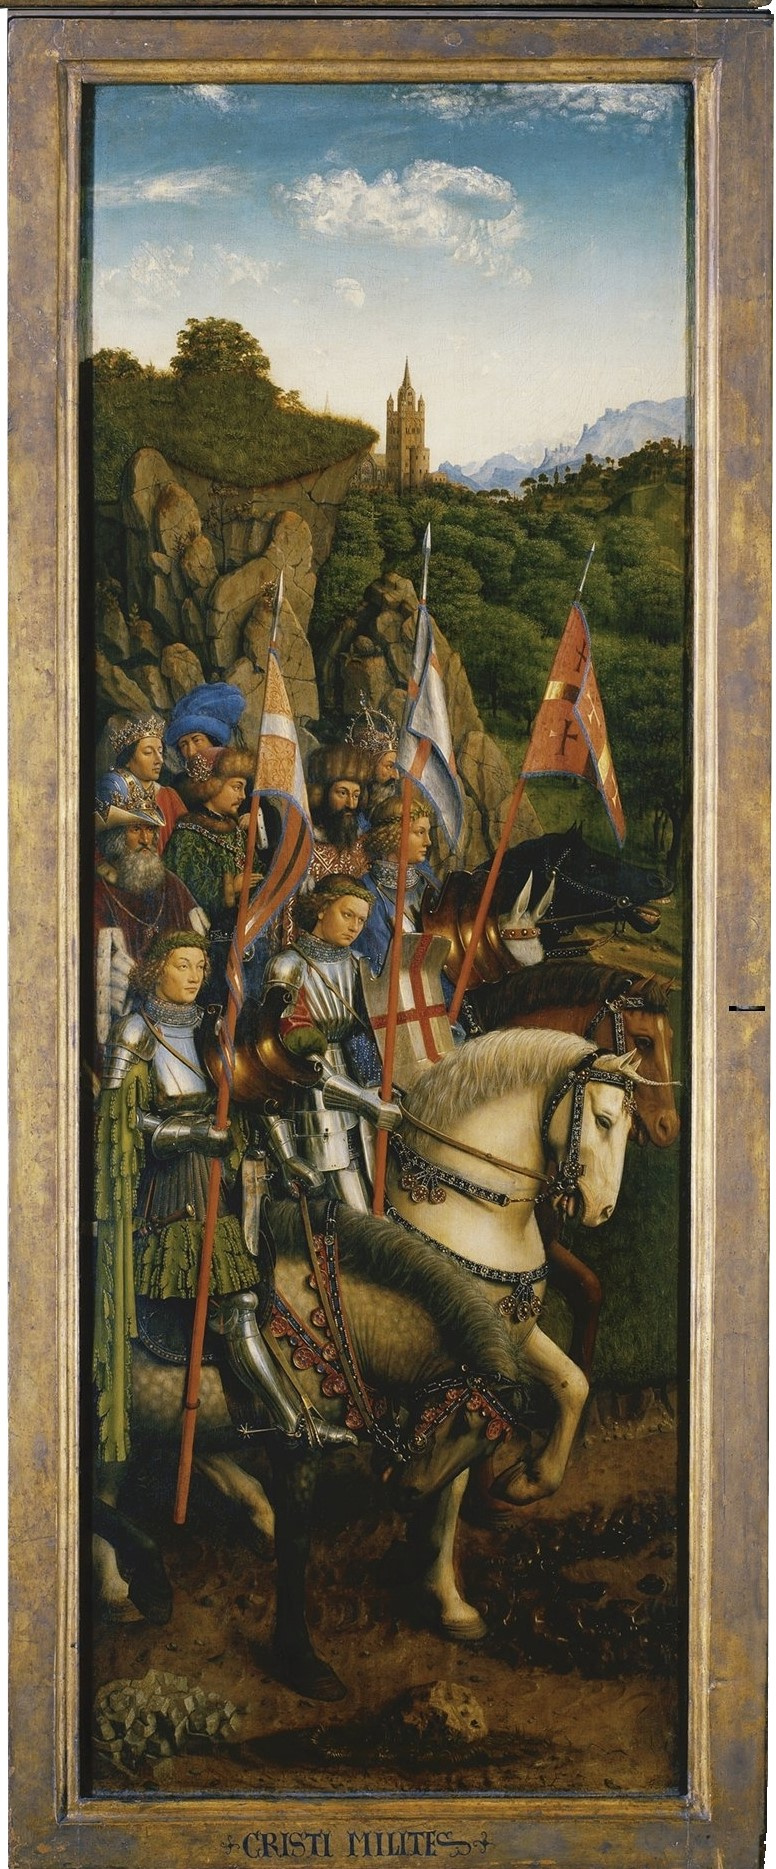 Jan van Eyck. The Ghent altarpiece. Army of Christ (fragment)